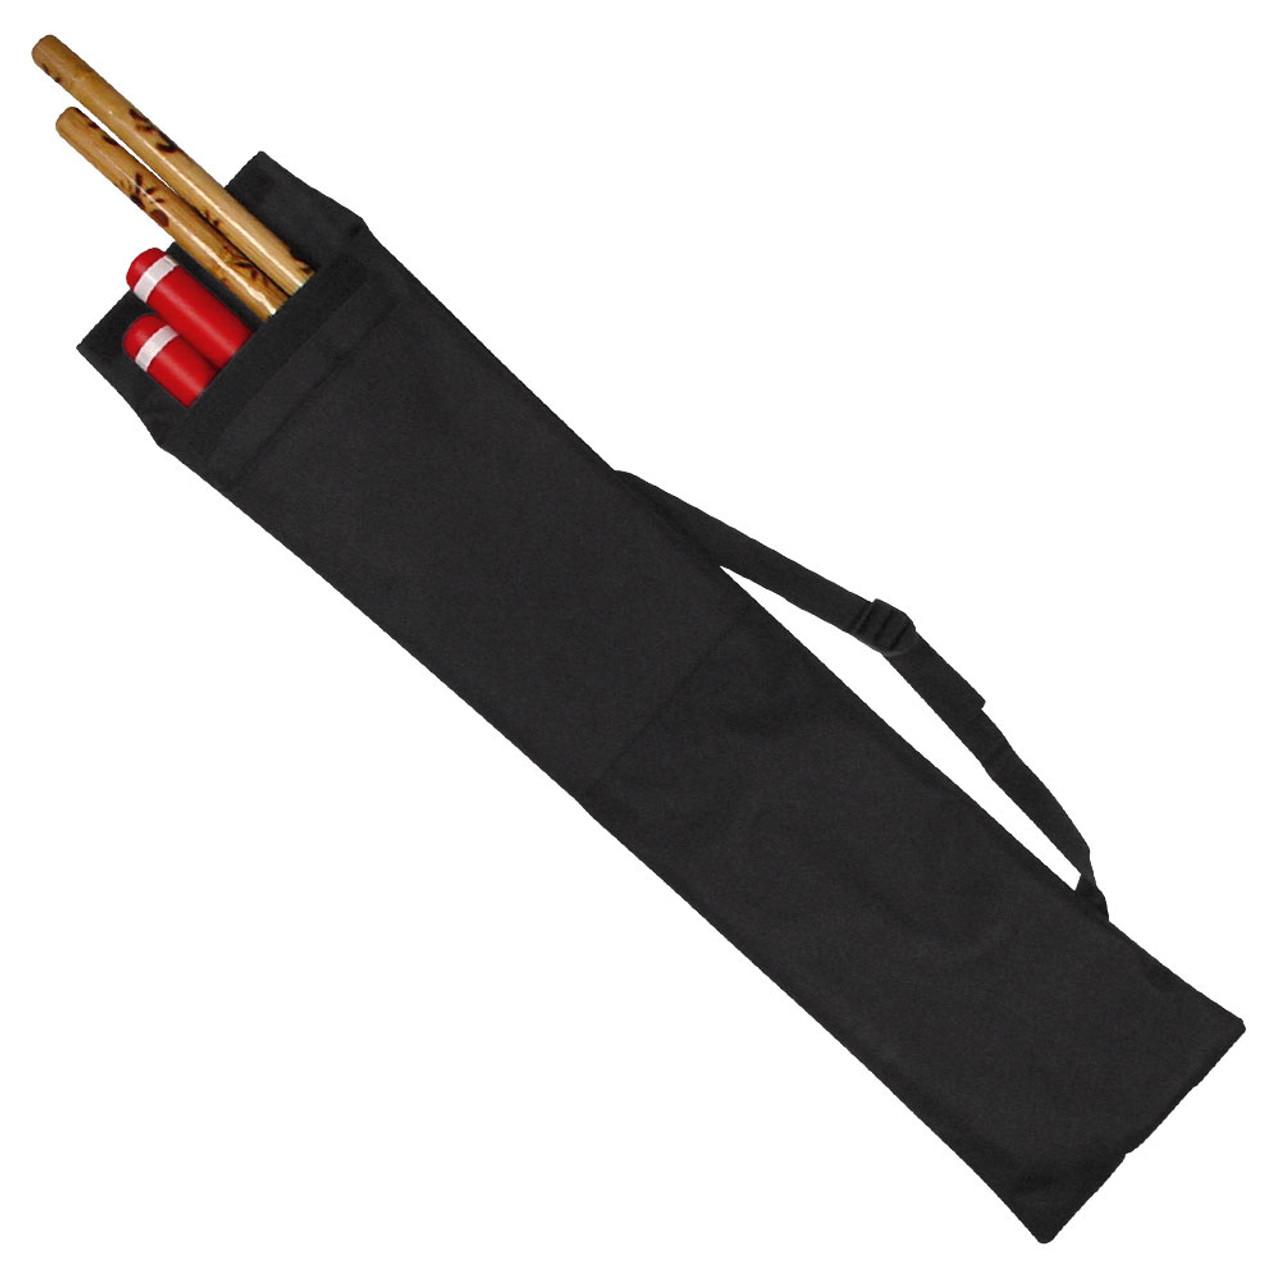 Stick Carry Case